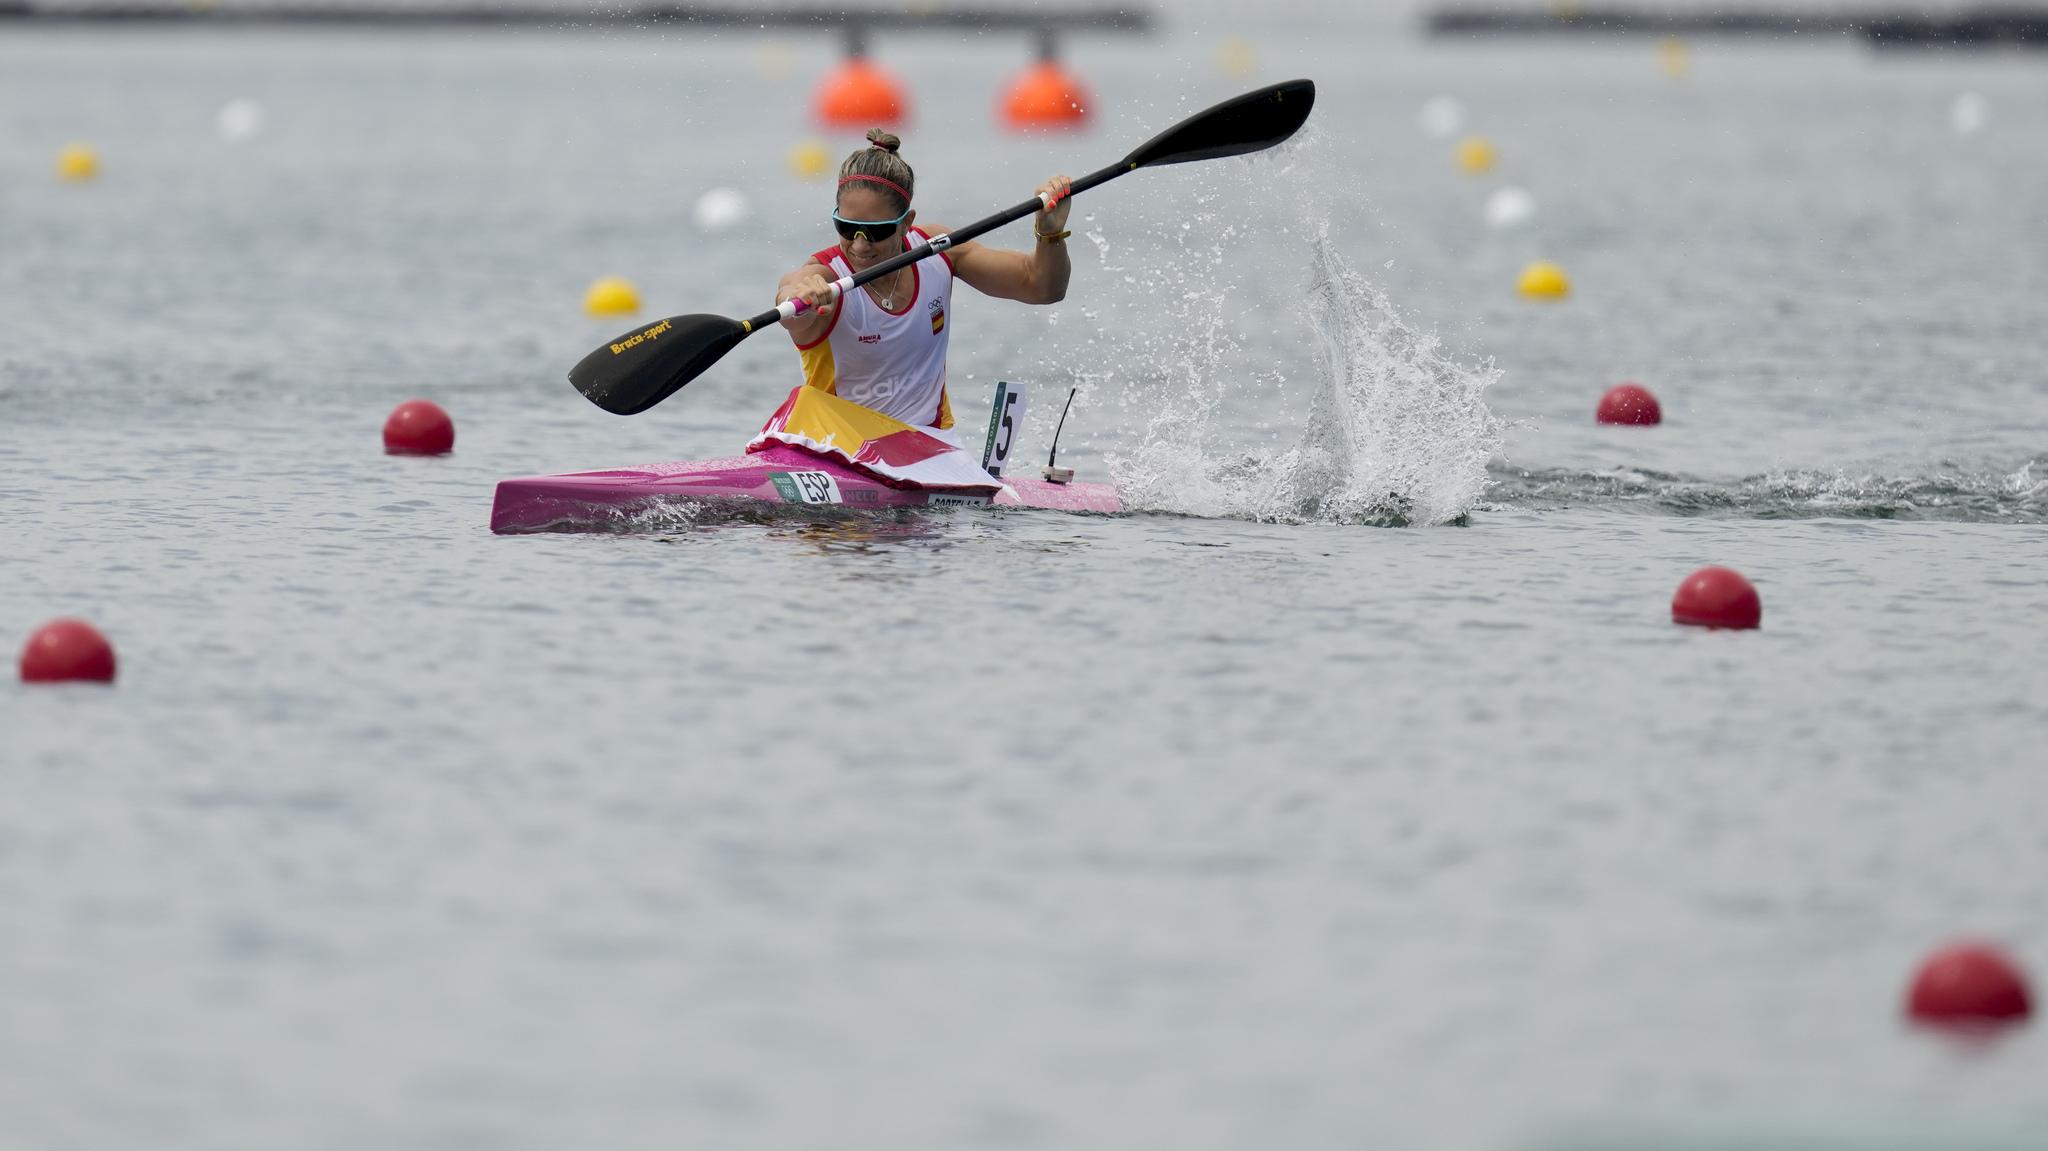 lt;HIT gt;Teresa lt;/HIT gt; lt;HIT gt;Portela lt;/HIT gt; of Spain competes in the women's kayak single 200m heat during the 2020 Summer Olympics, Monday, Aug. 2, 2021, in Tokyo, Japan. (AP Photo/Lee Jin-man)